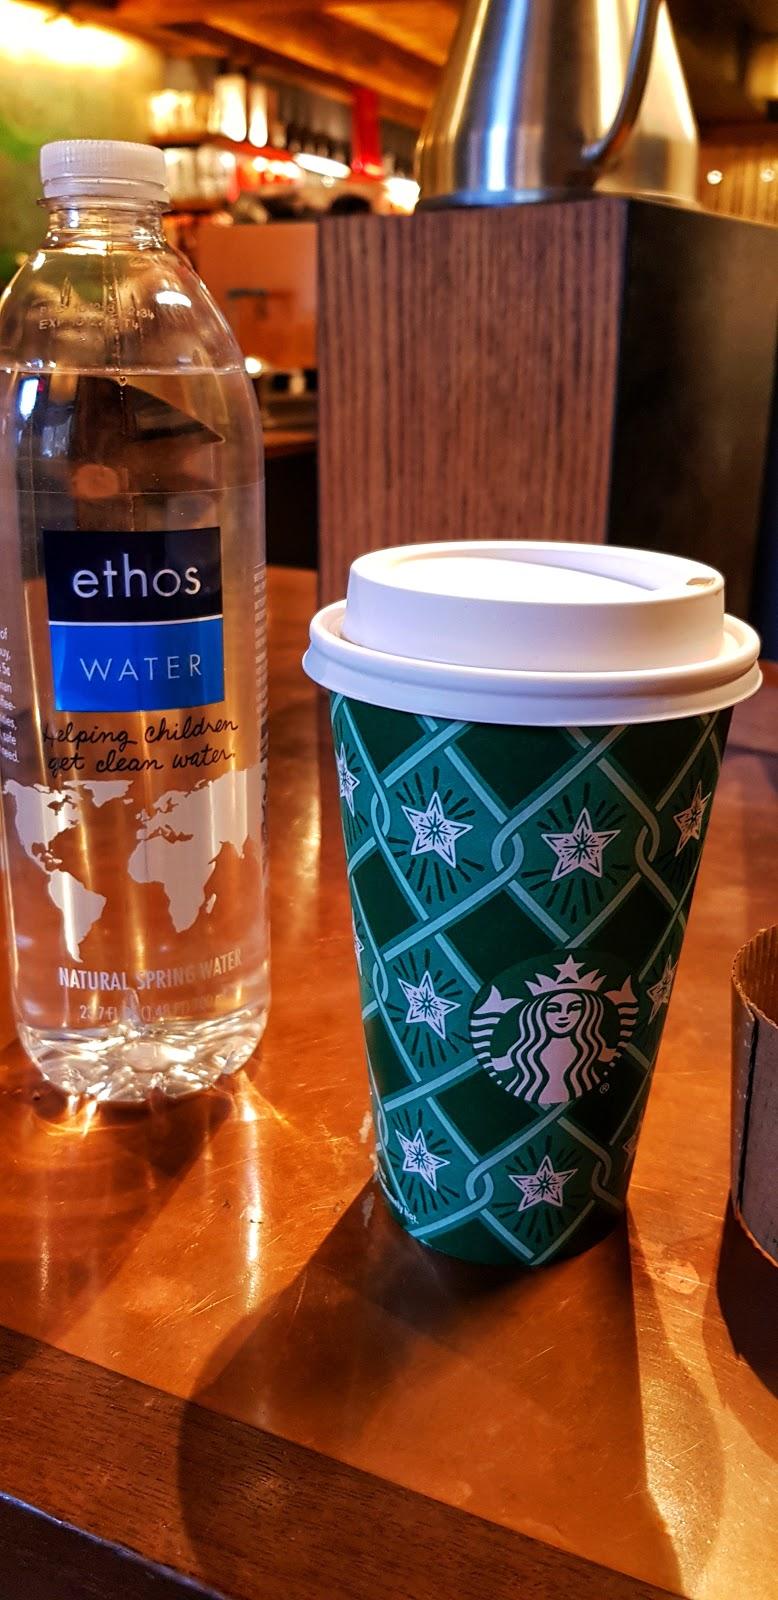 Starbucks - cafe  | Photo 7 of 10 | Address: 11 Old Fulton St, Brooklyn, NY 11201, USA | Phone: (917) 685-7717